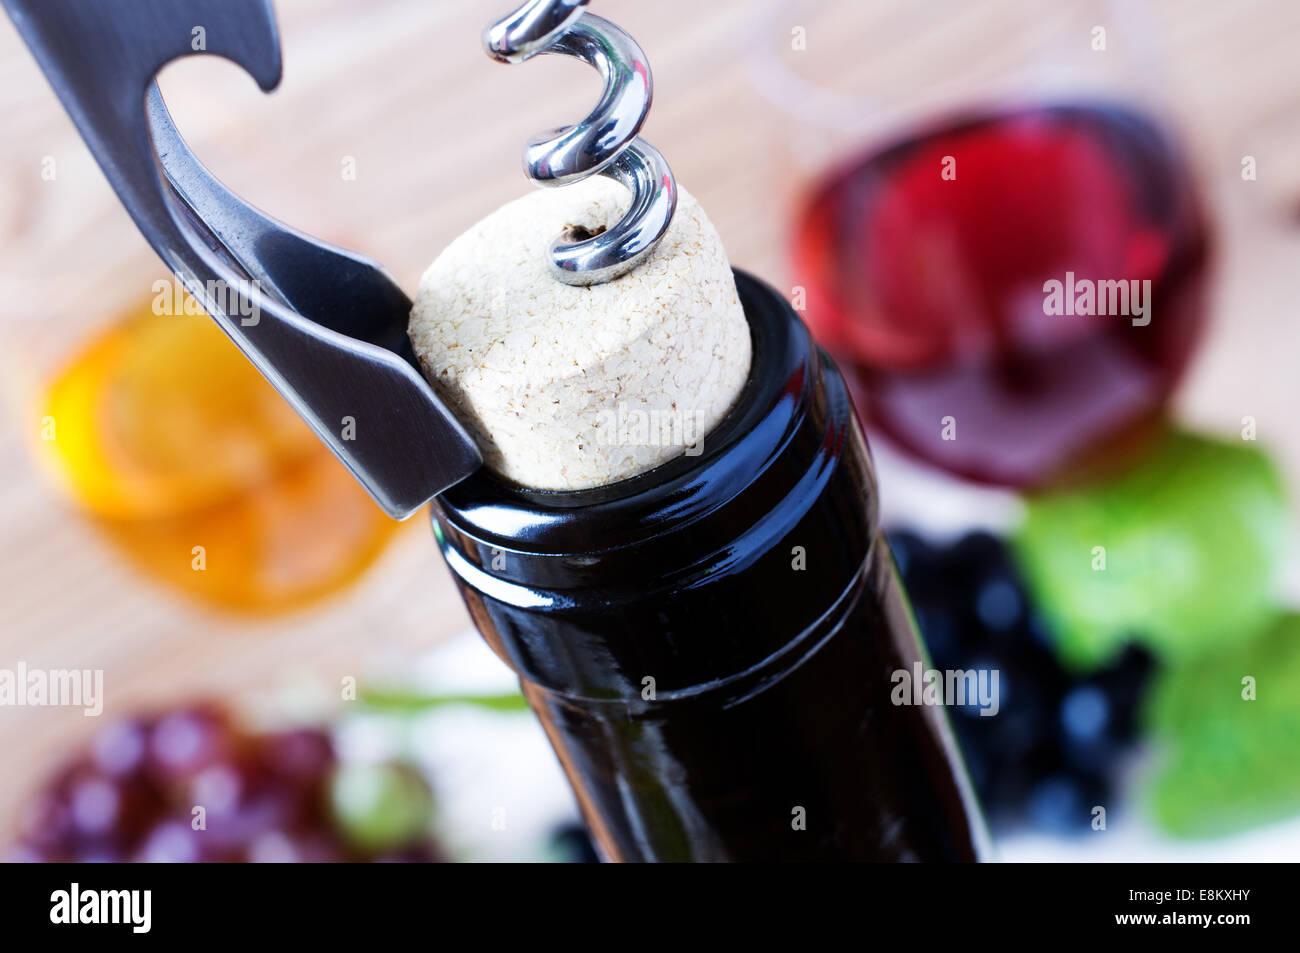 Corkscrew opening a bottle of wine Stock Photo